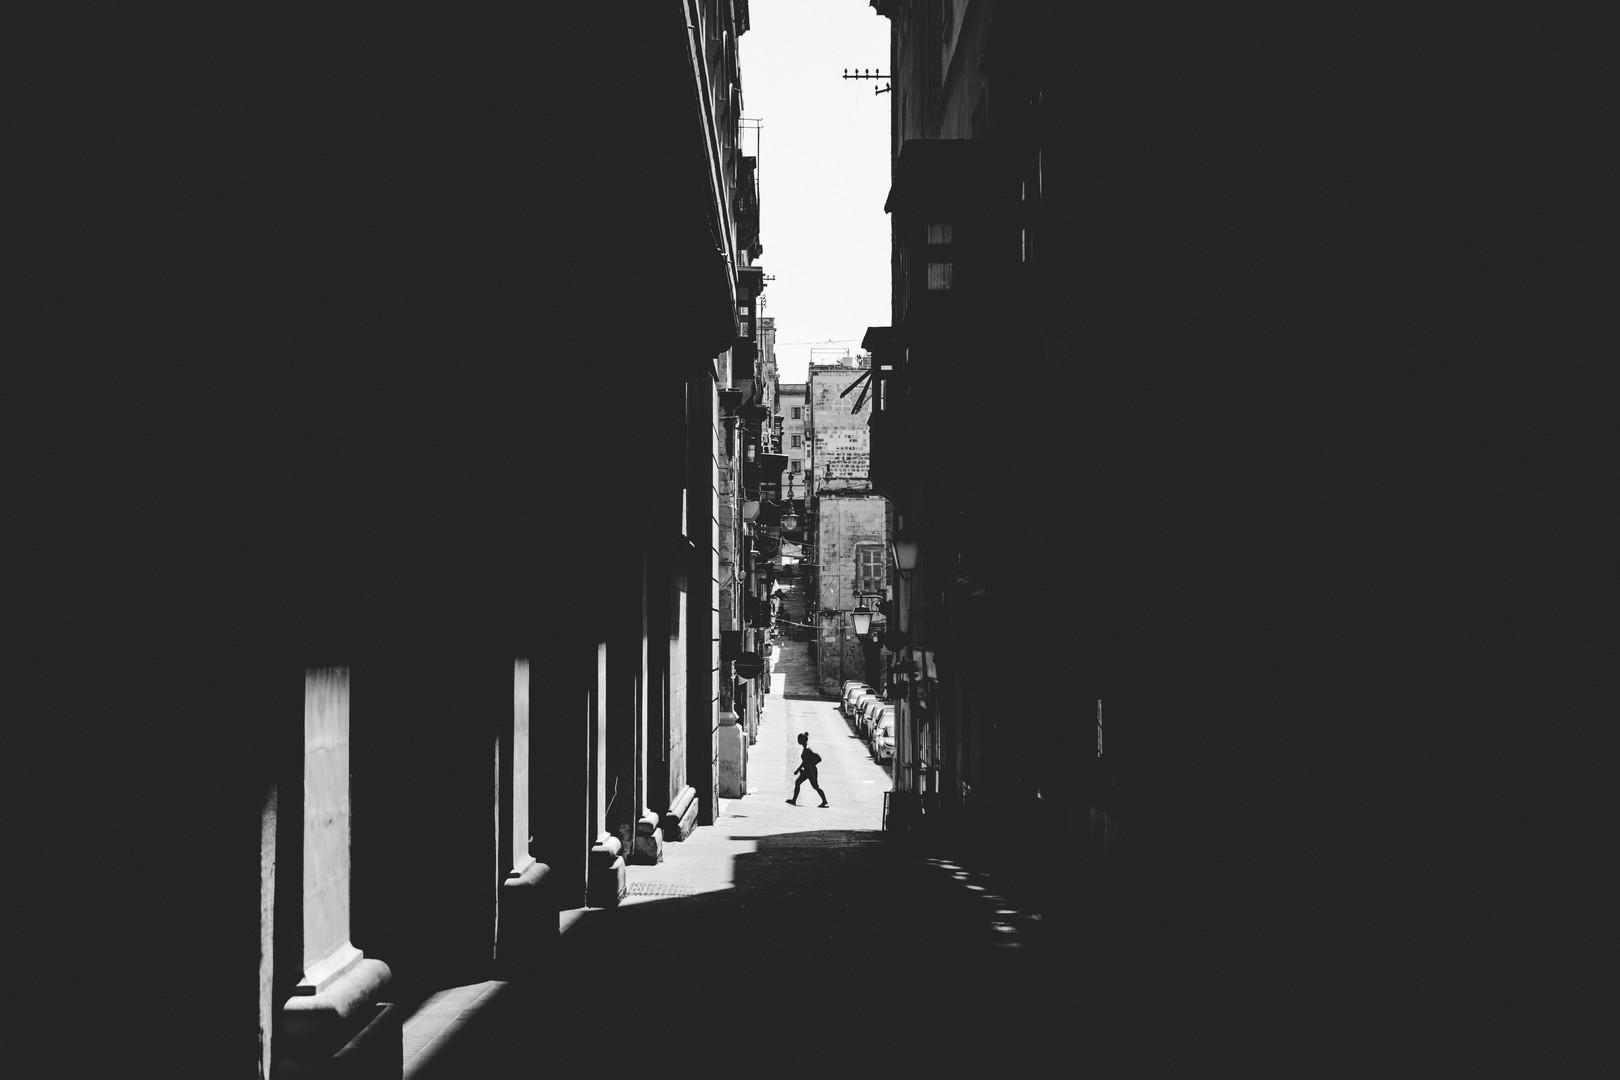 Monochrome street